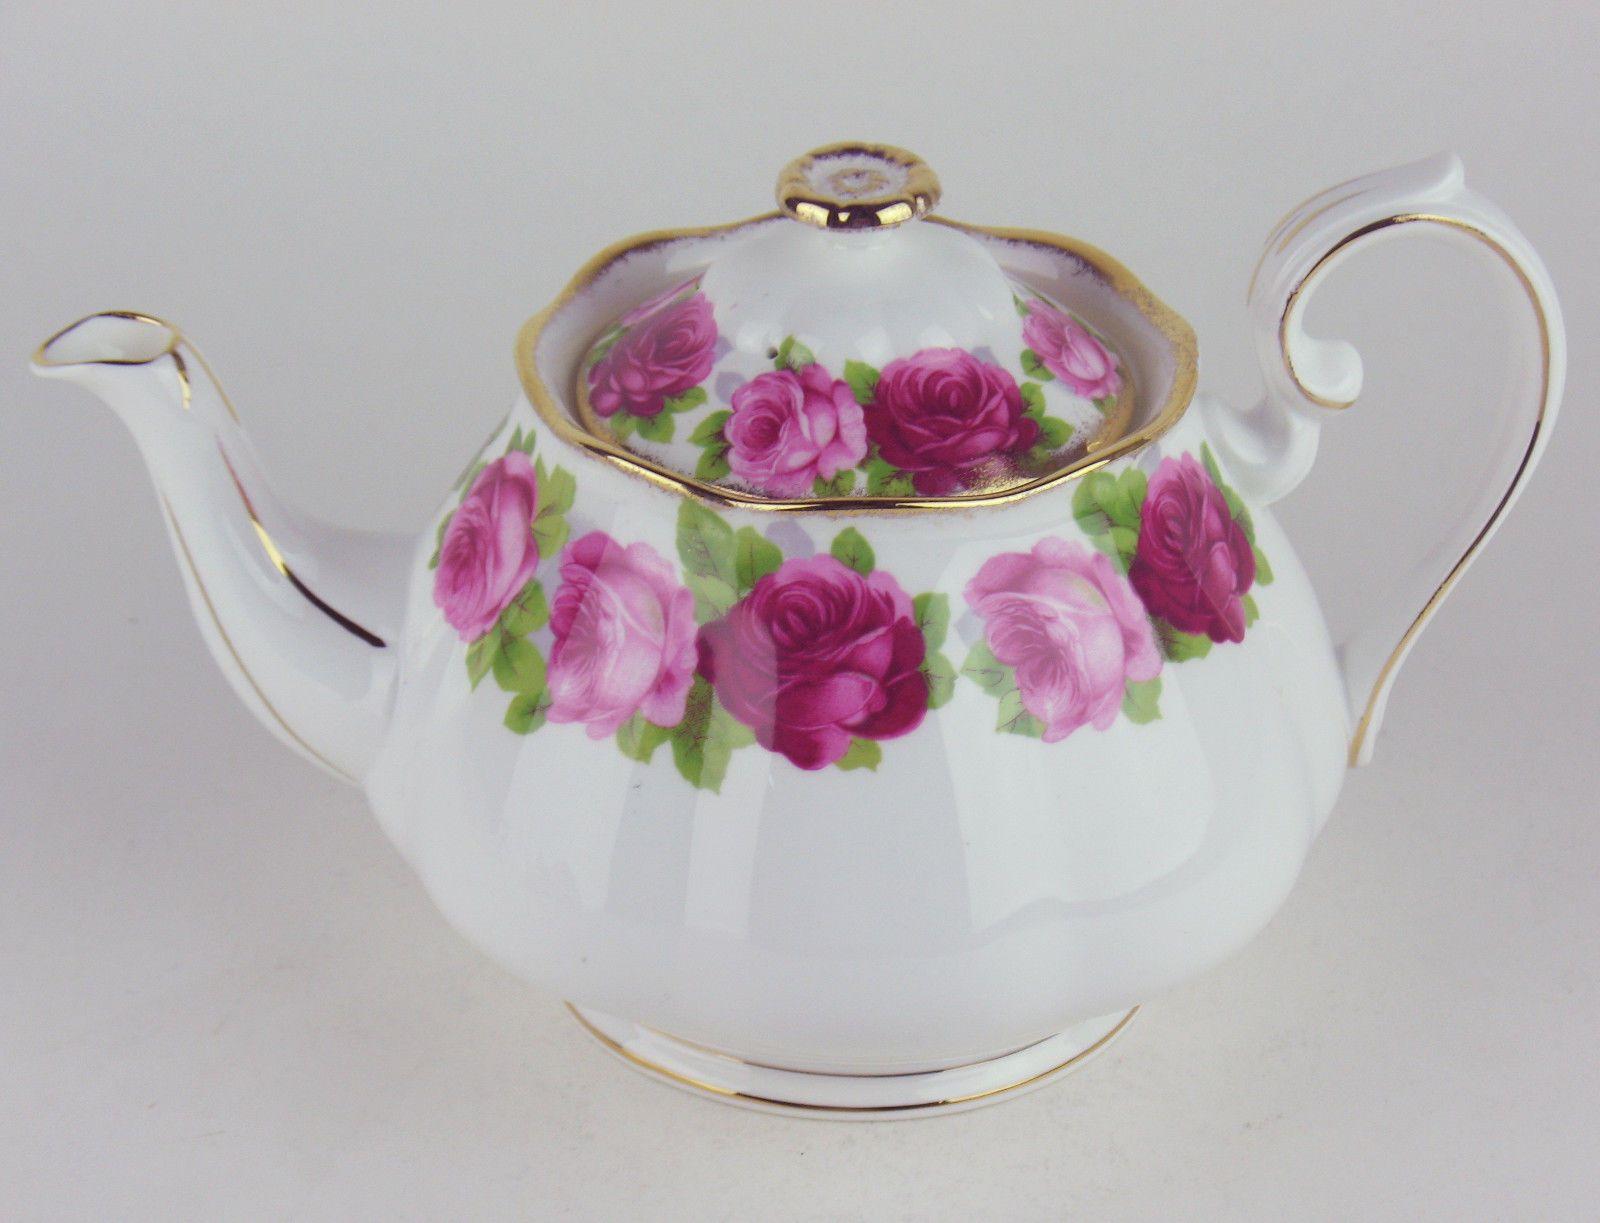 Royal albert bone china tea cup amp saucer winsome pattern ebay - Large Teapot Royal Albert Old English Rose Bone China England